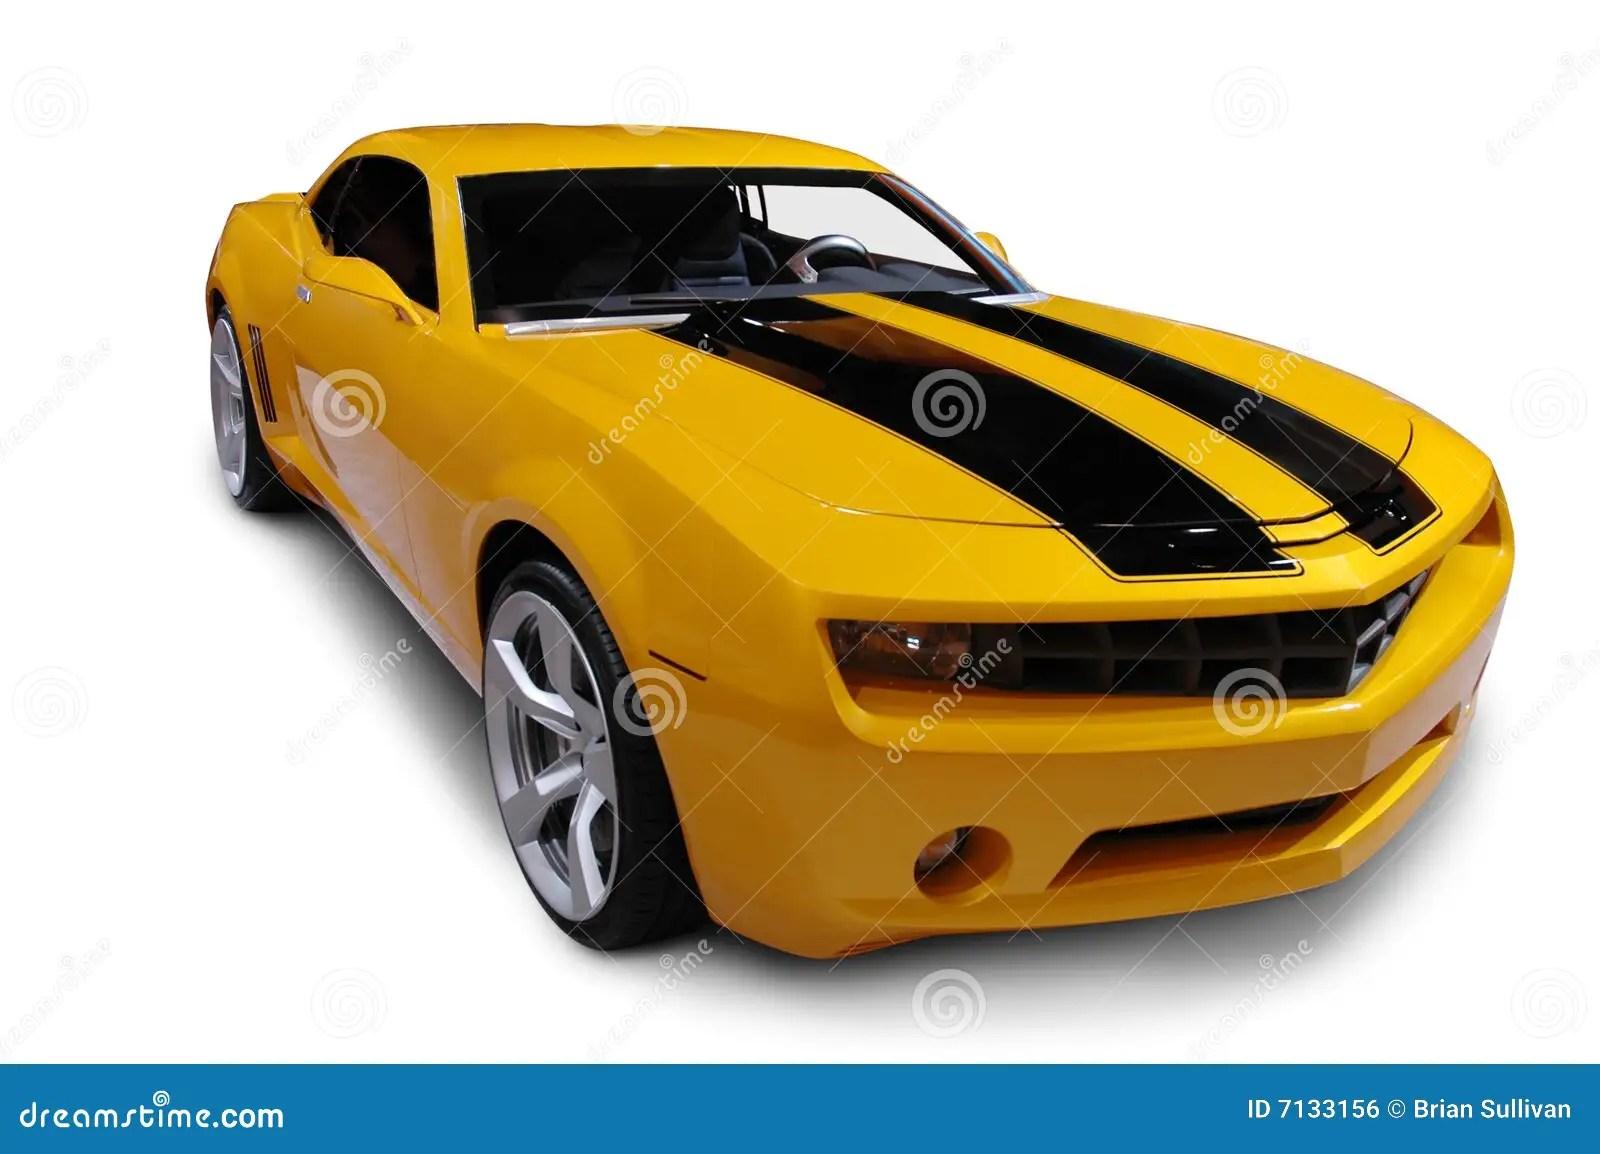 Race Car Wallpaper Free Download Yellow 2009 Camaro Royalty Free Stock Image Image 7133156